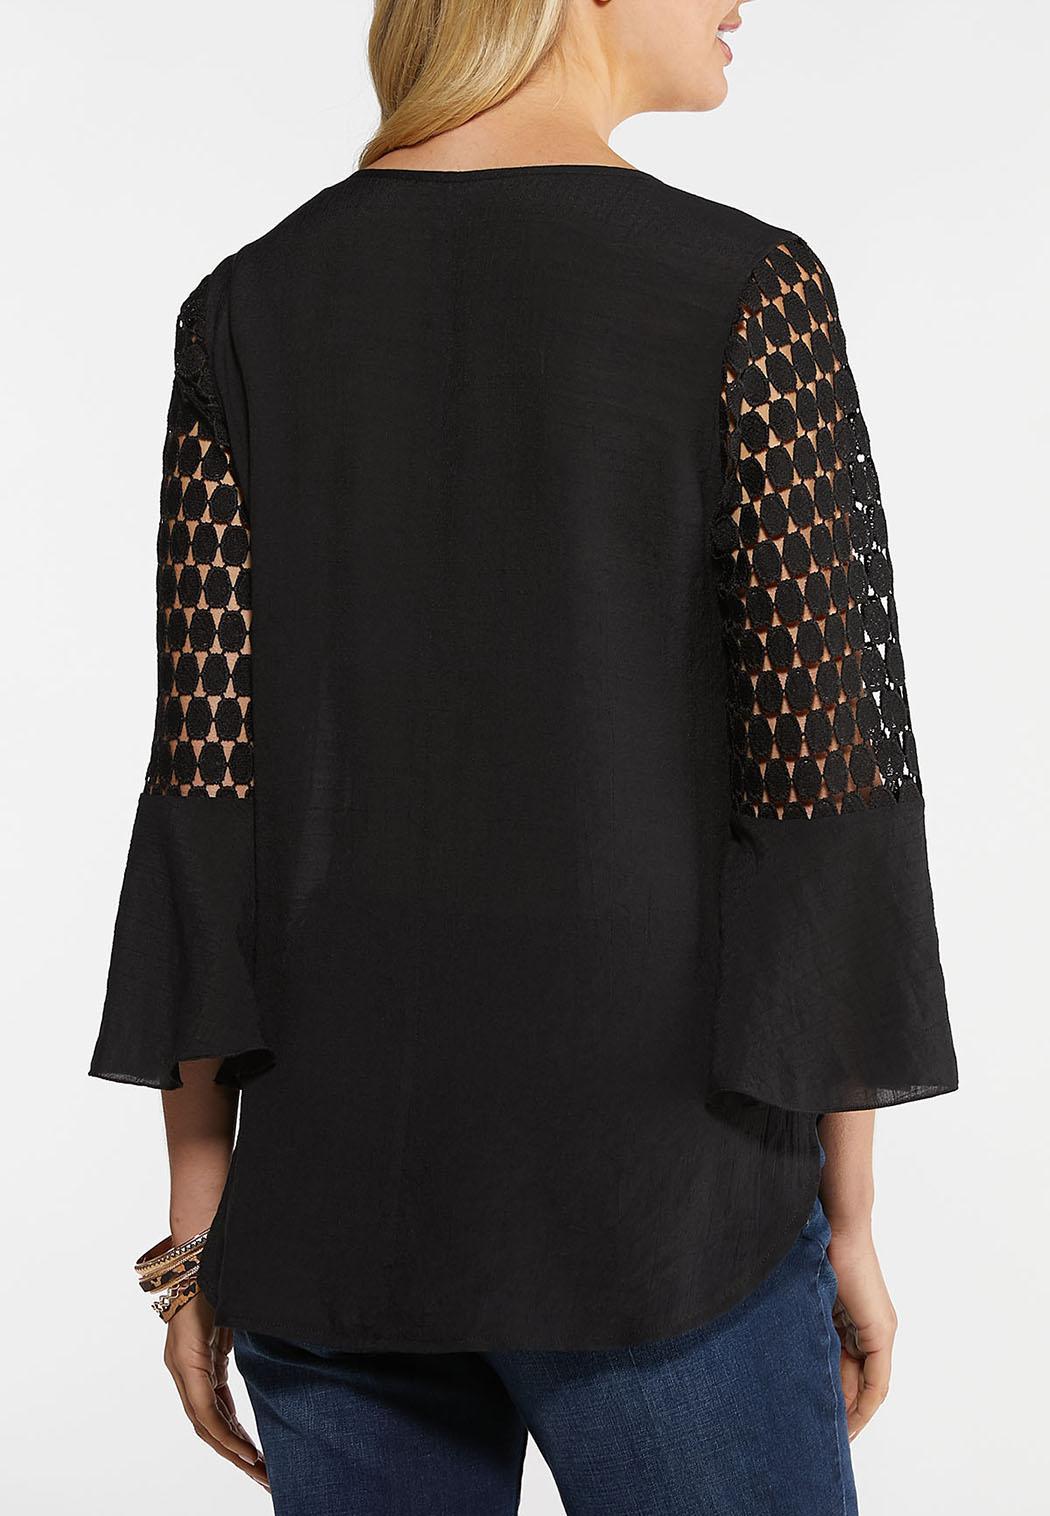 Crochet Bell Sleeve Top (Item #44028717)